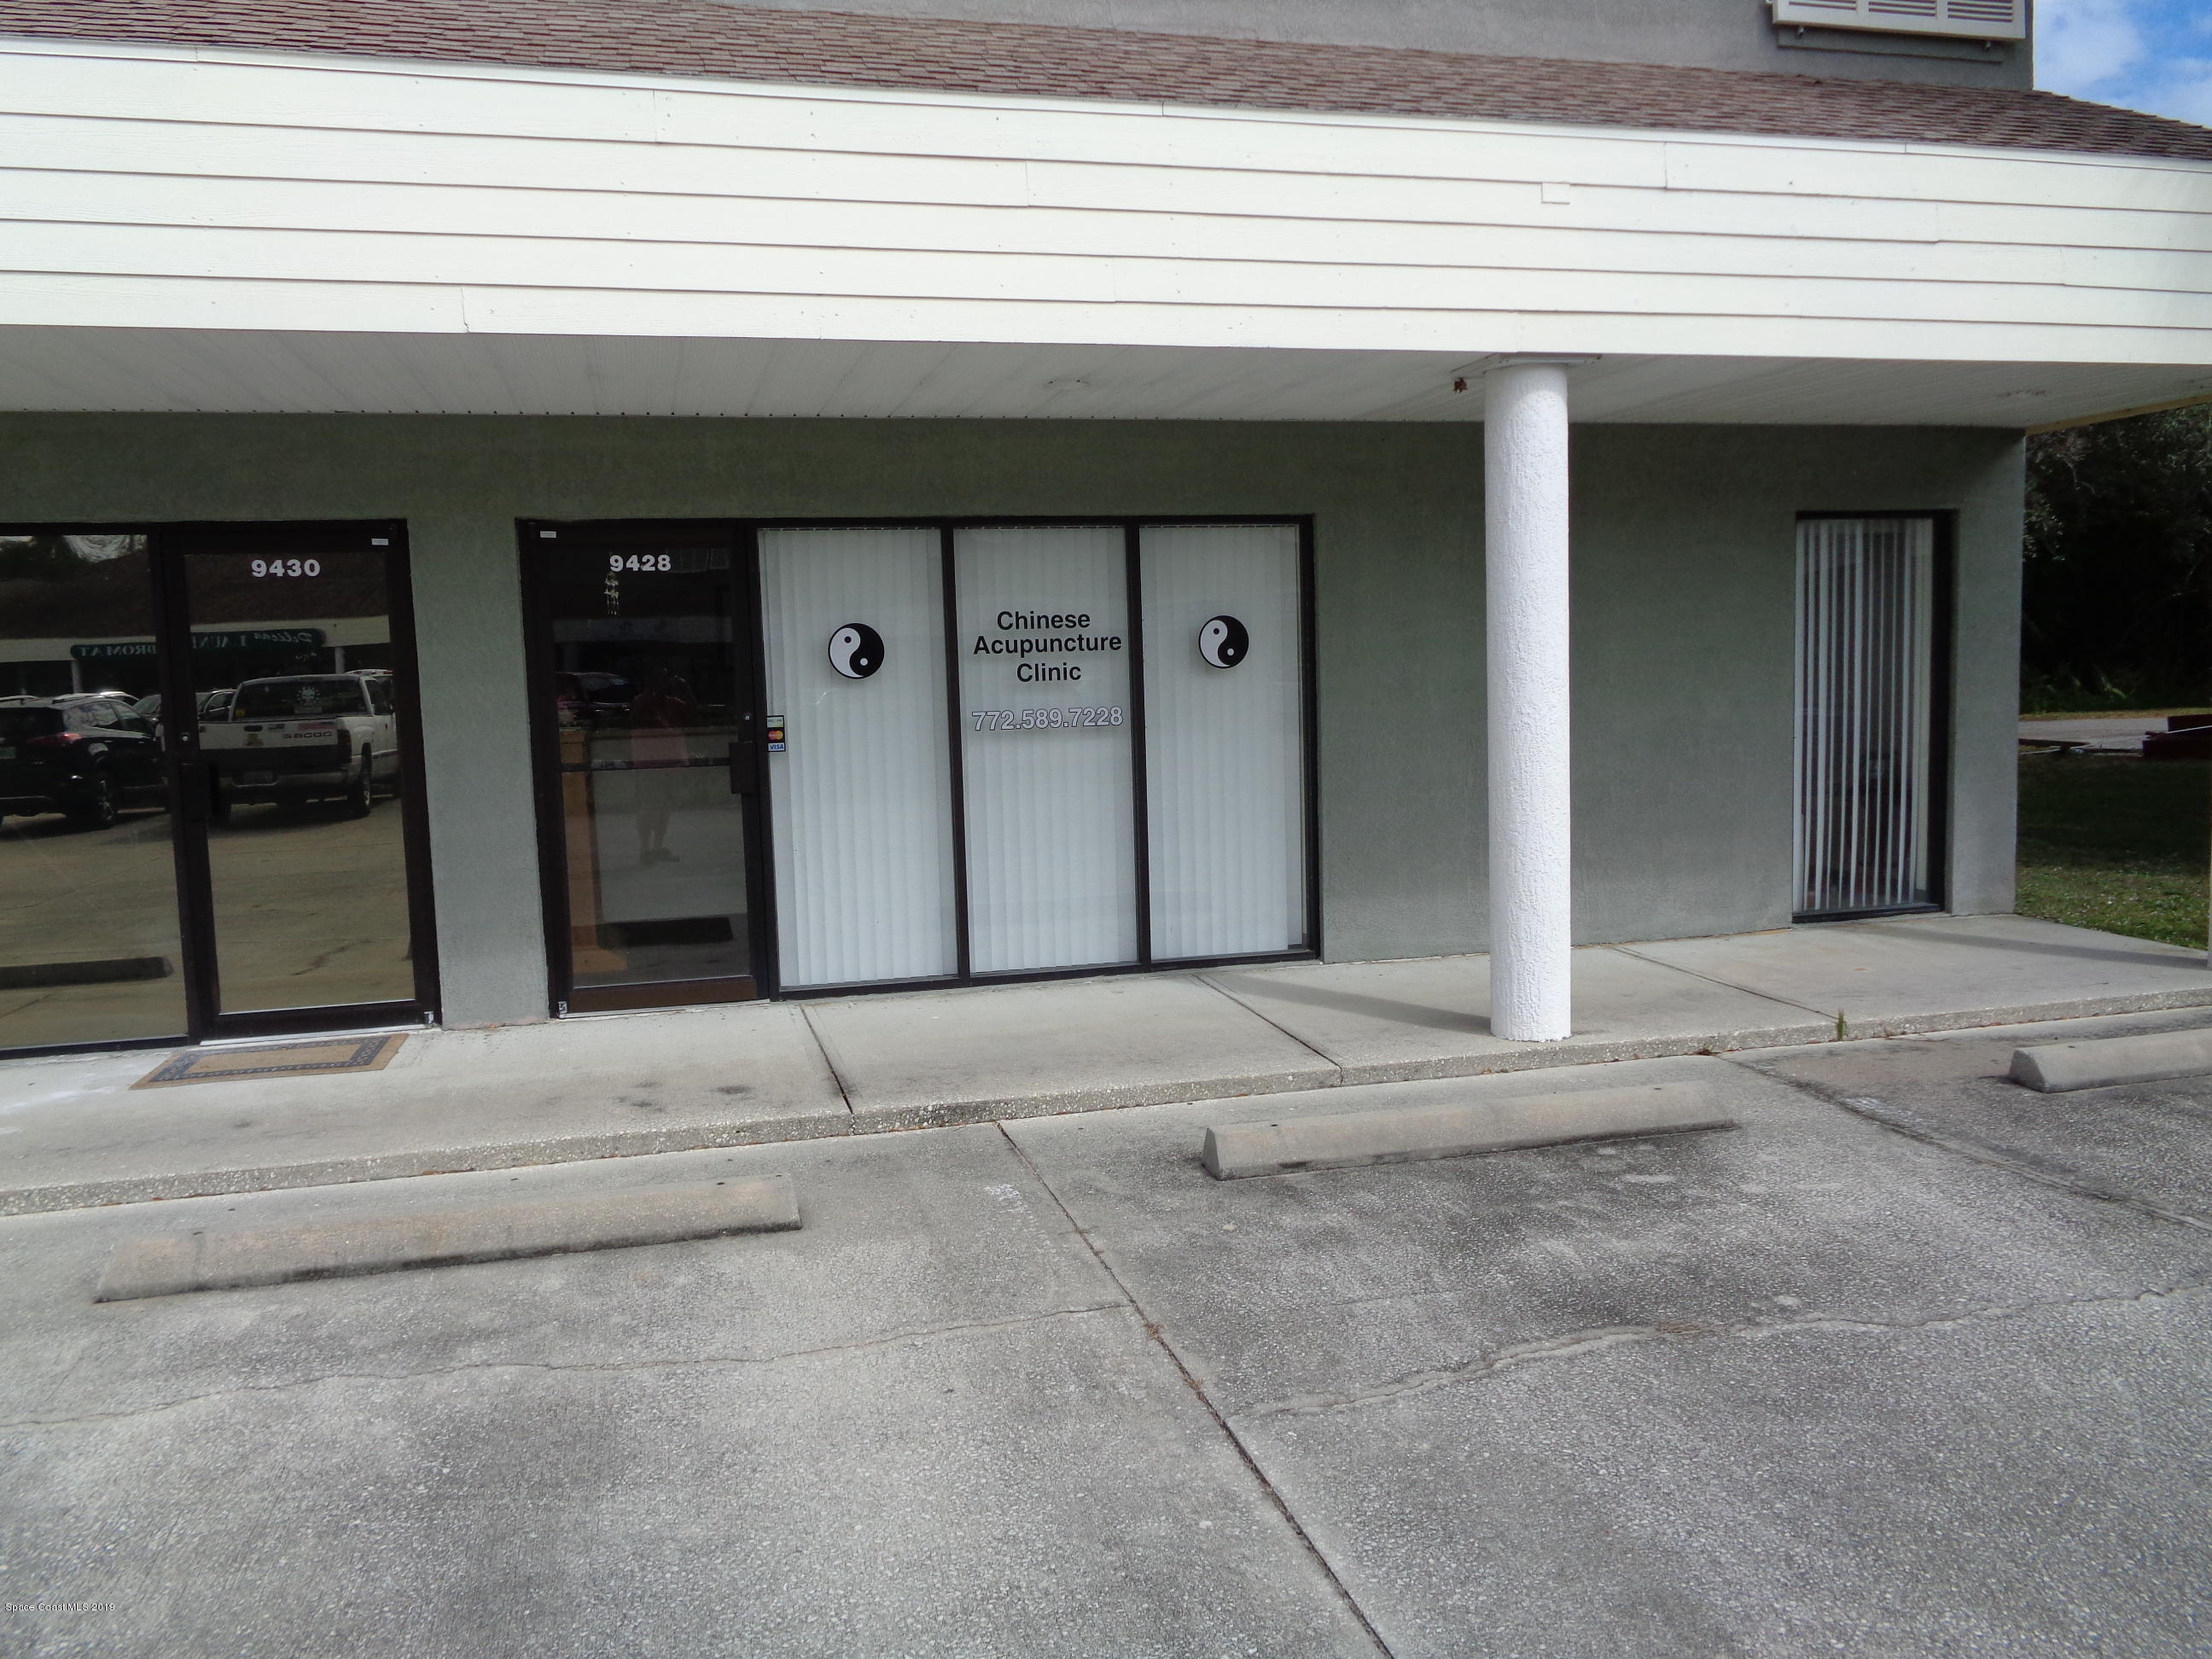 Commercial for Sale at 9428 U.S. Highway 1 Sebastian, Florida 32958 United States